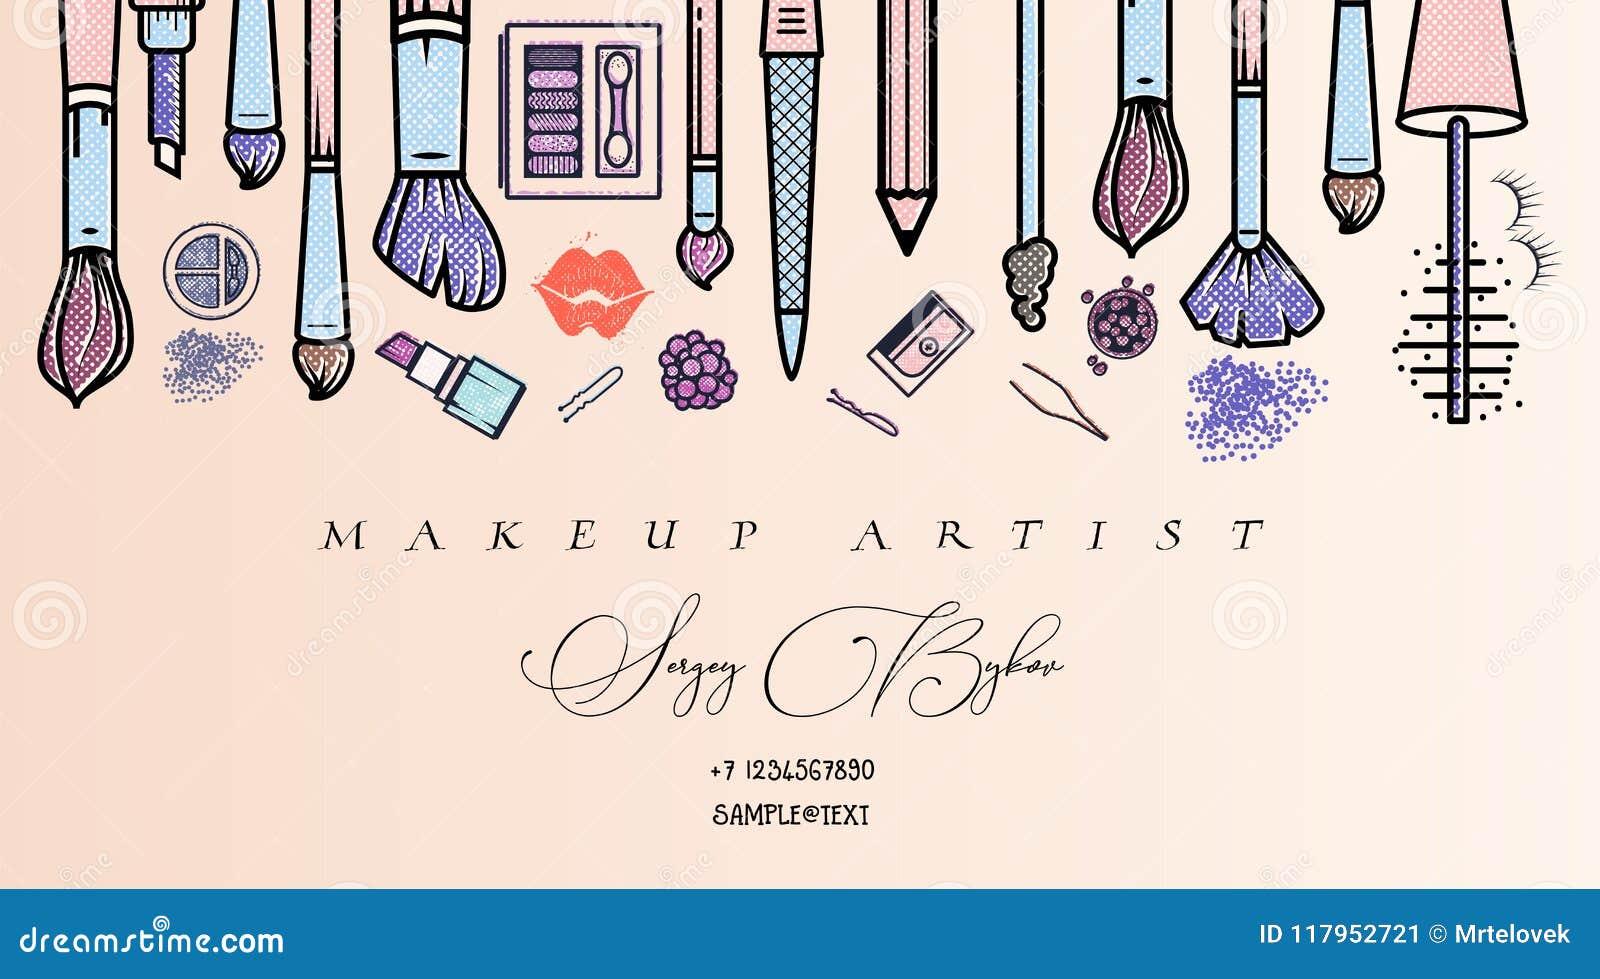 Makeup Artist Banner  Beauty Salon Fashion Trends Background